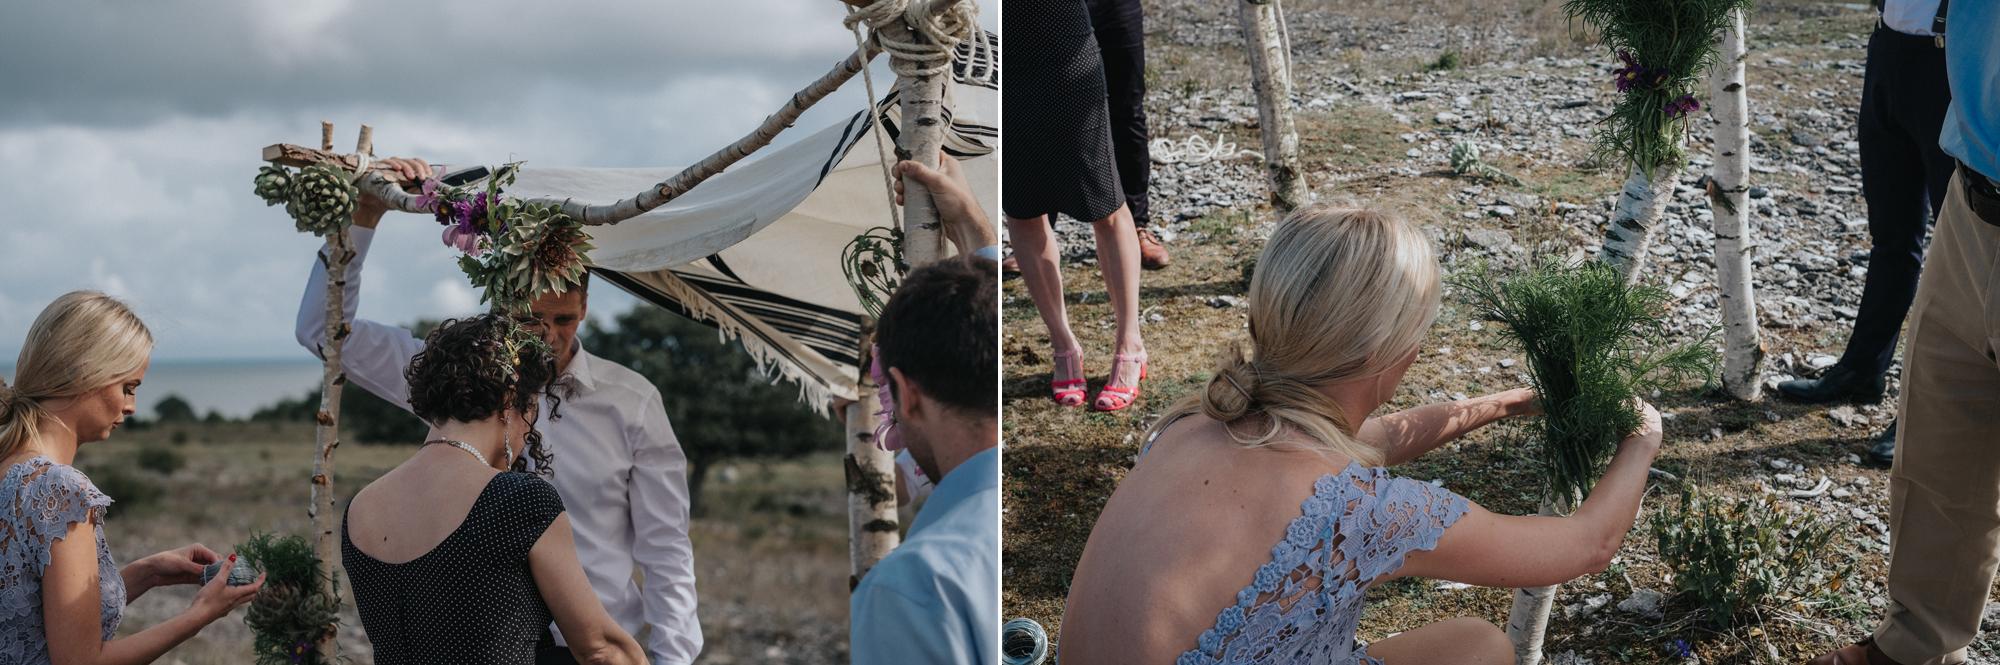 005-bröllop-stora-gåsemora-neas-fotografi.jpg